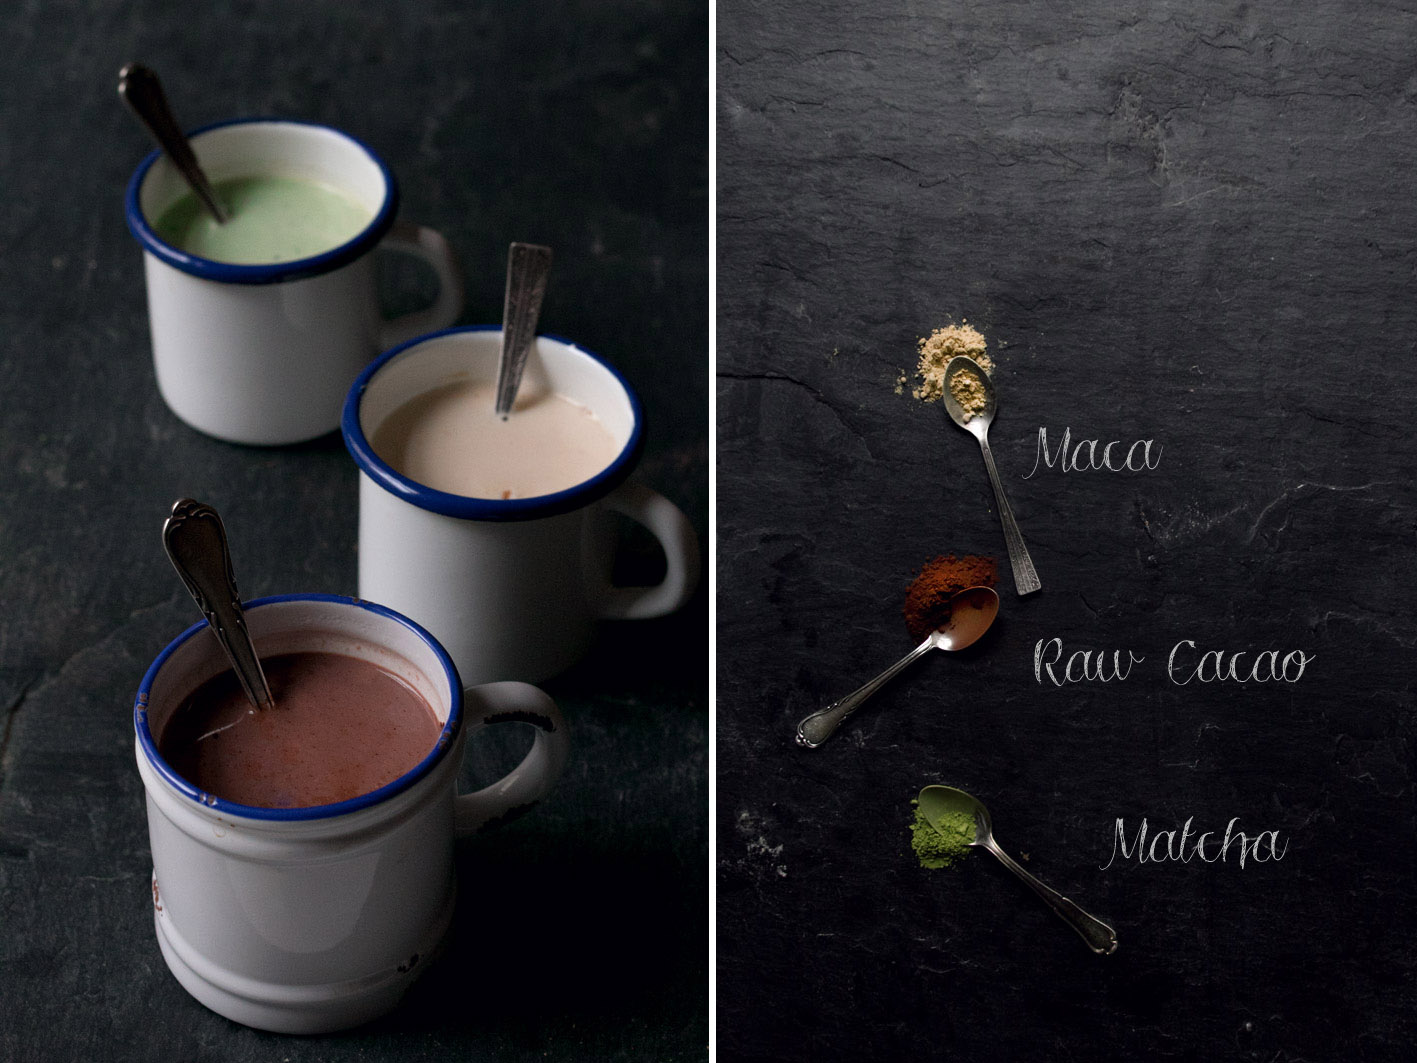 matcha-latte-maca-cacao